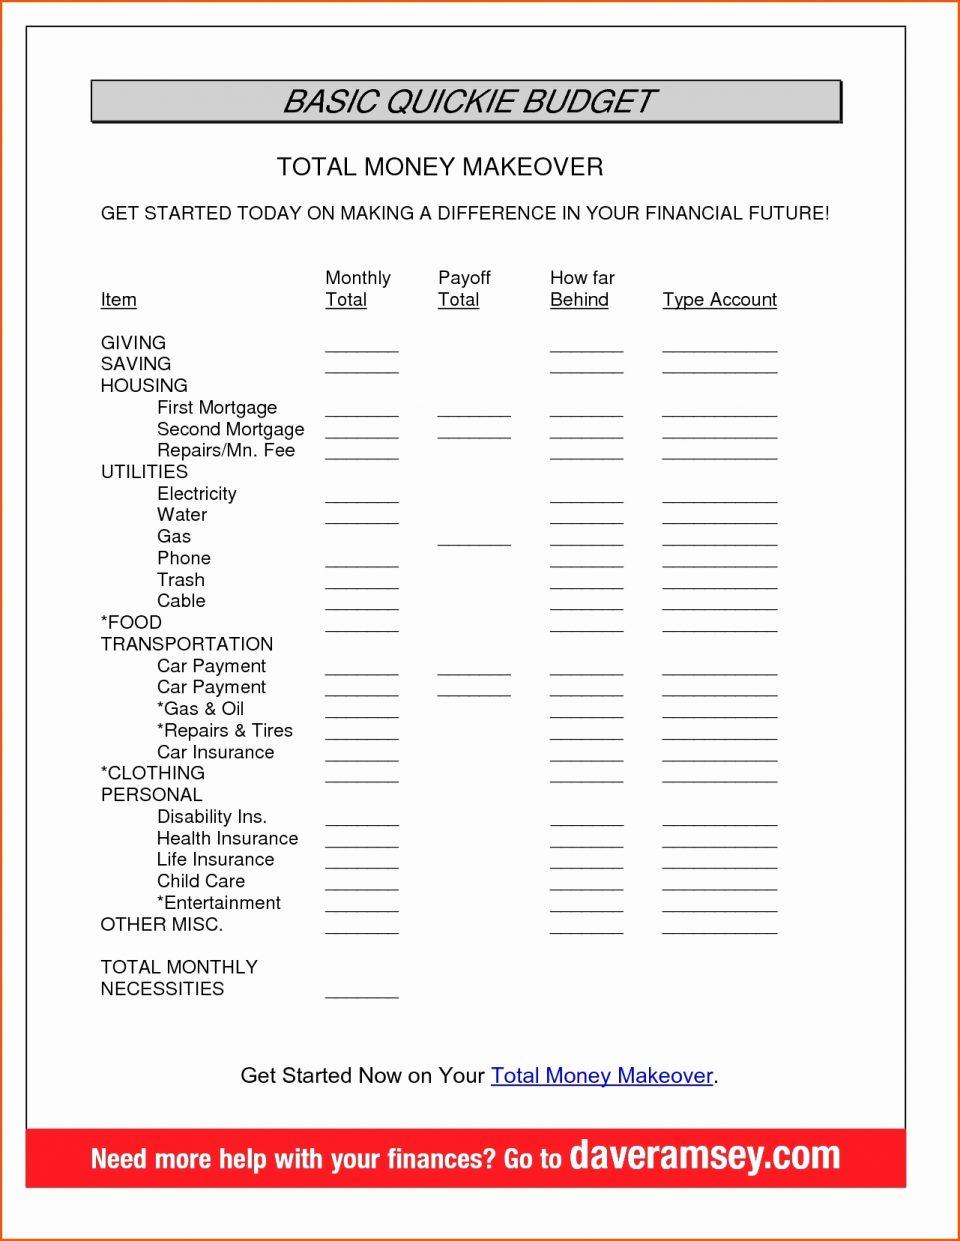 Novated Lease Calculator Spreadsheet Regarding Example Of Lease Calculator Excel Spreadsheet  Pianotreasure